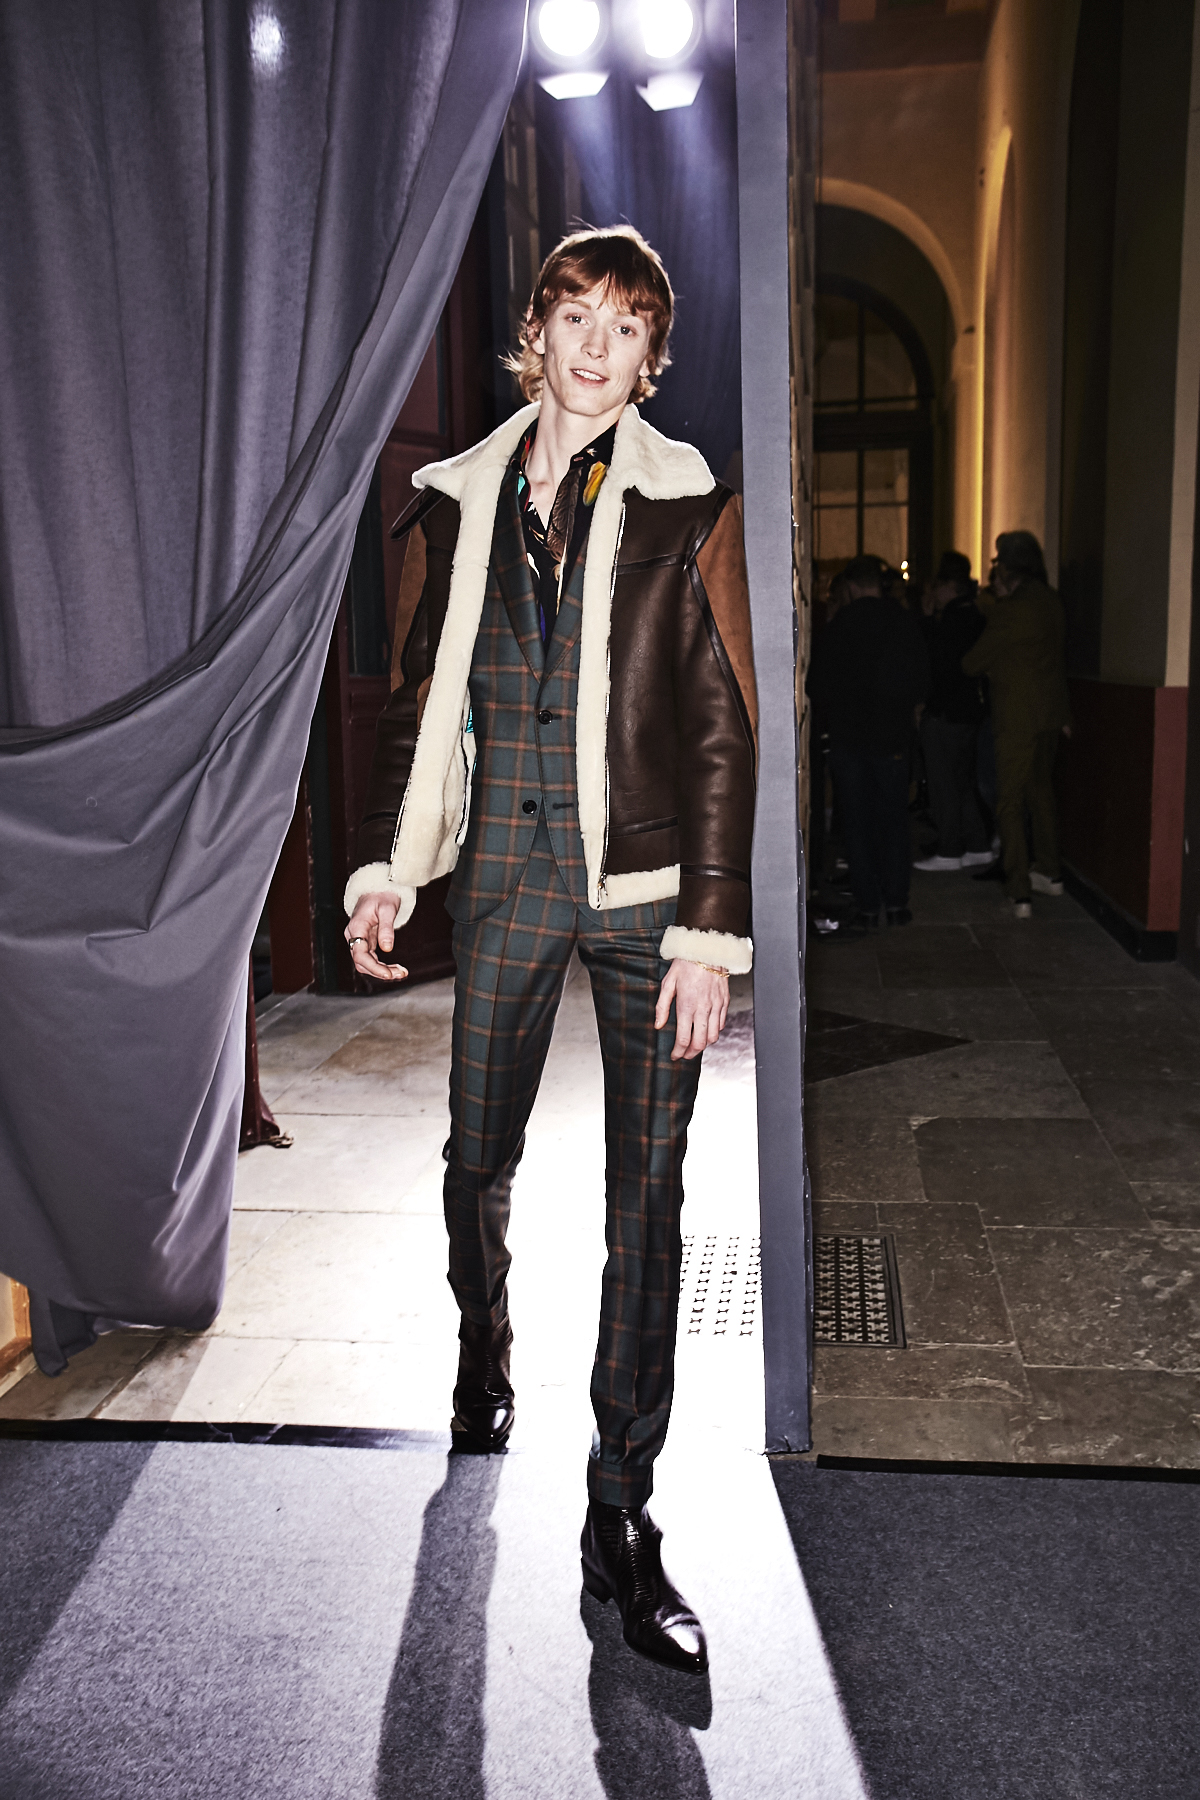 sonny vandevelde paul smith fall 17 men fashion show paris backstage. Black Bedroom Furniture Sets. Home Design Ideas